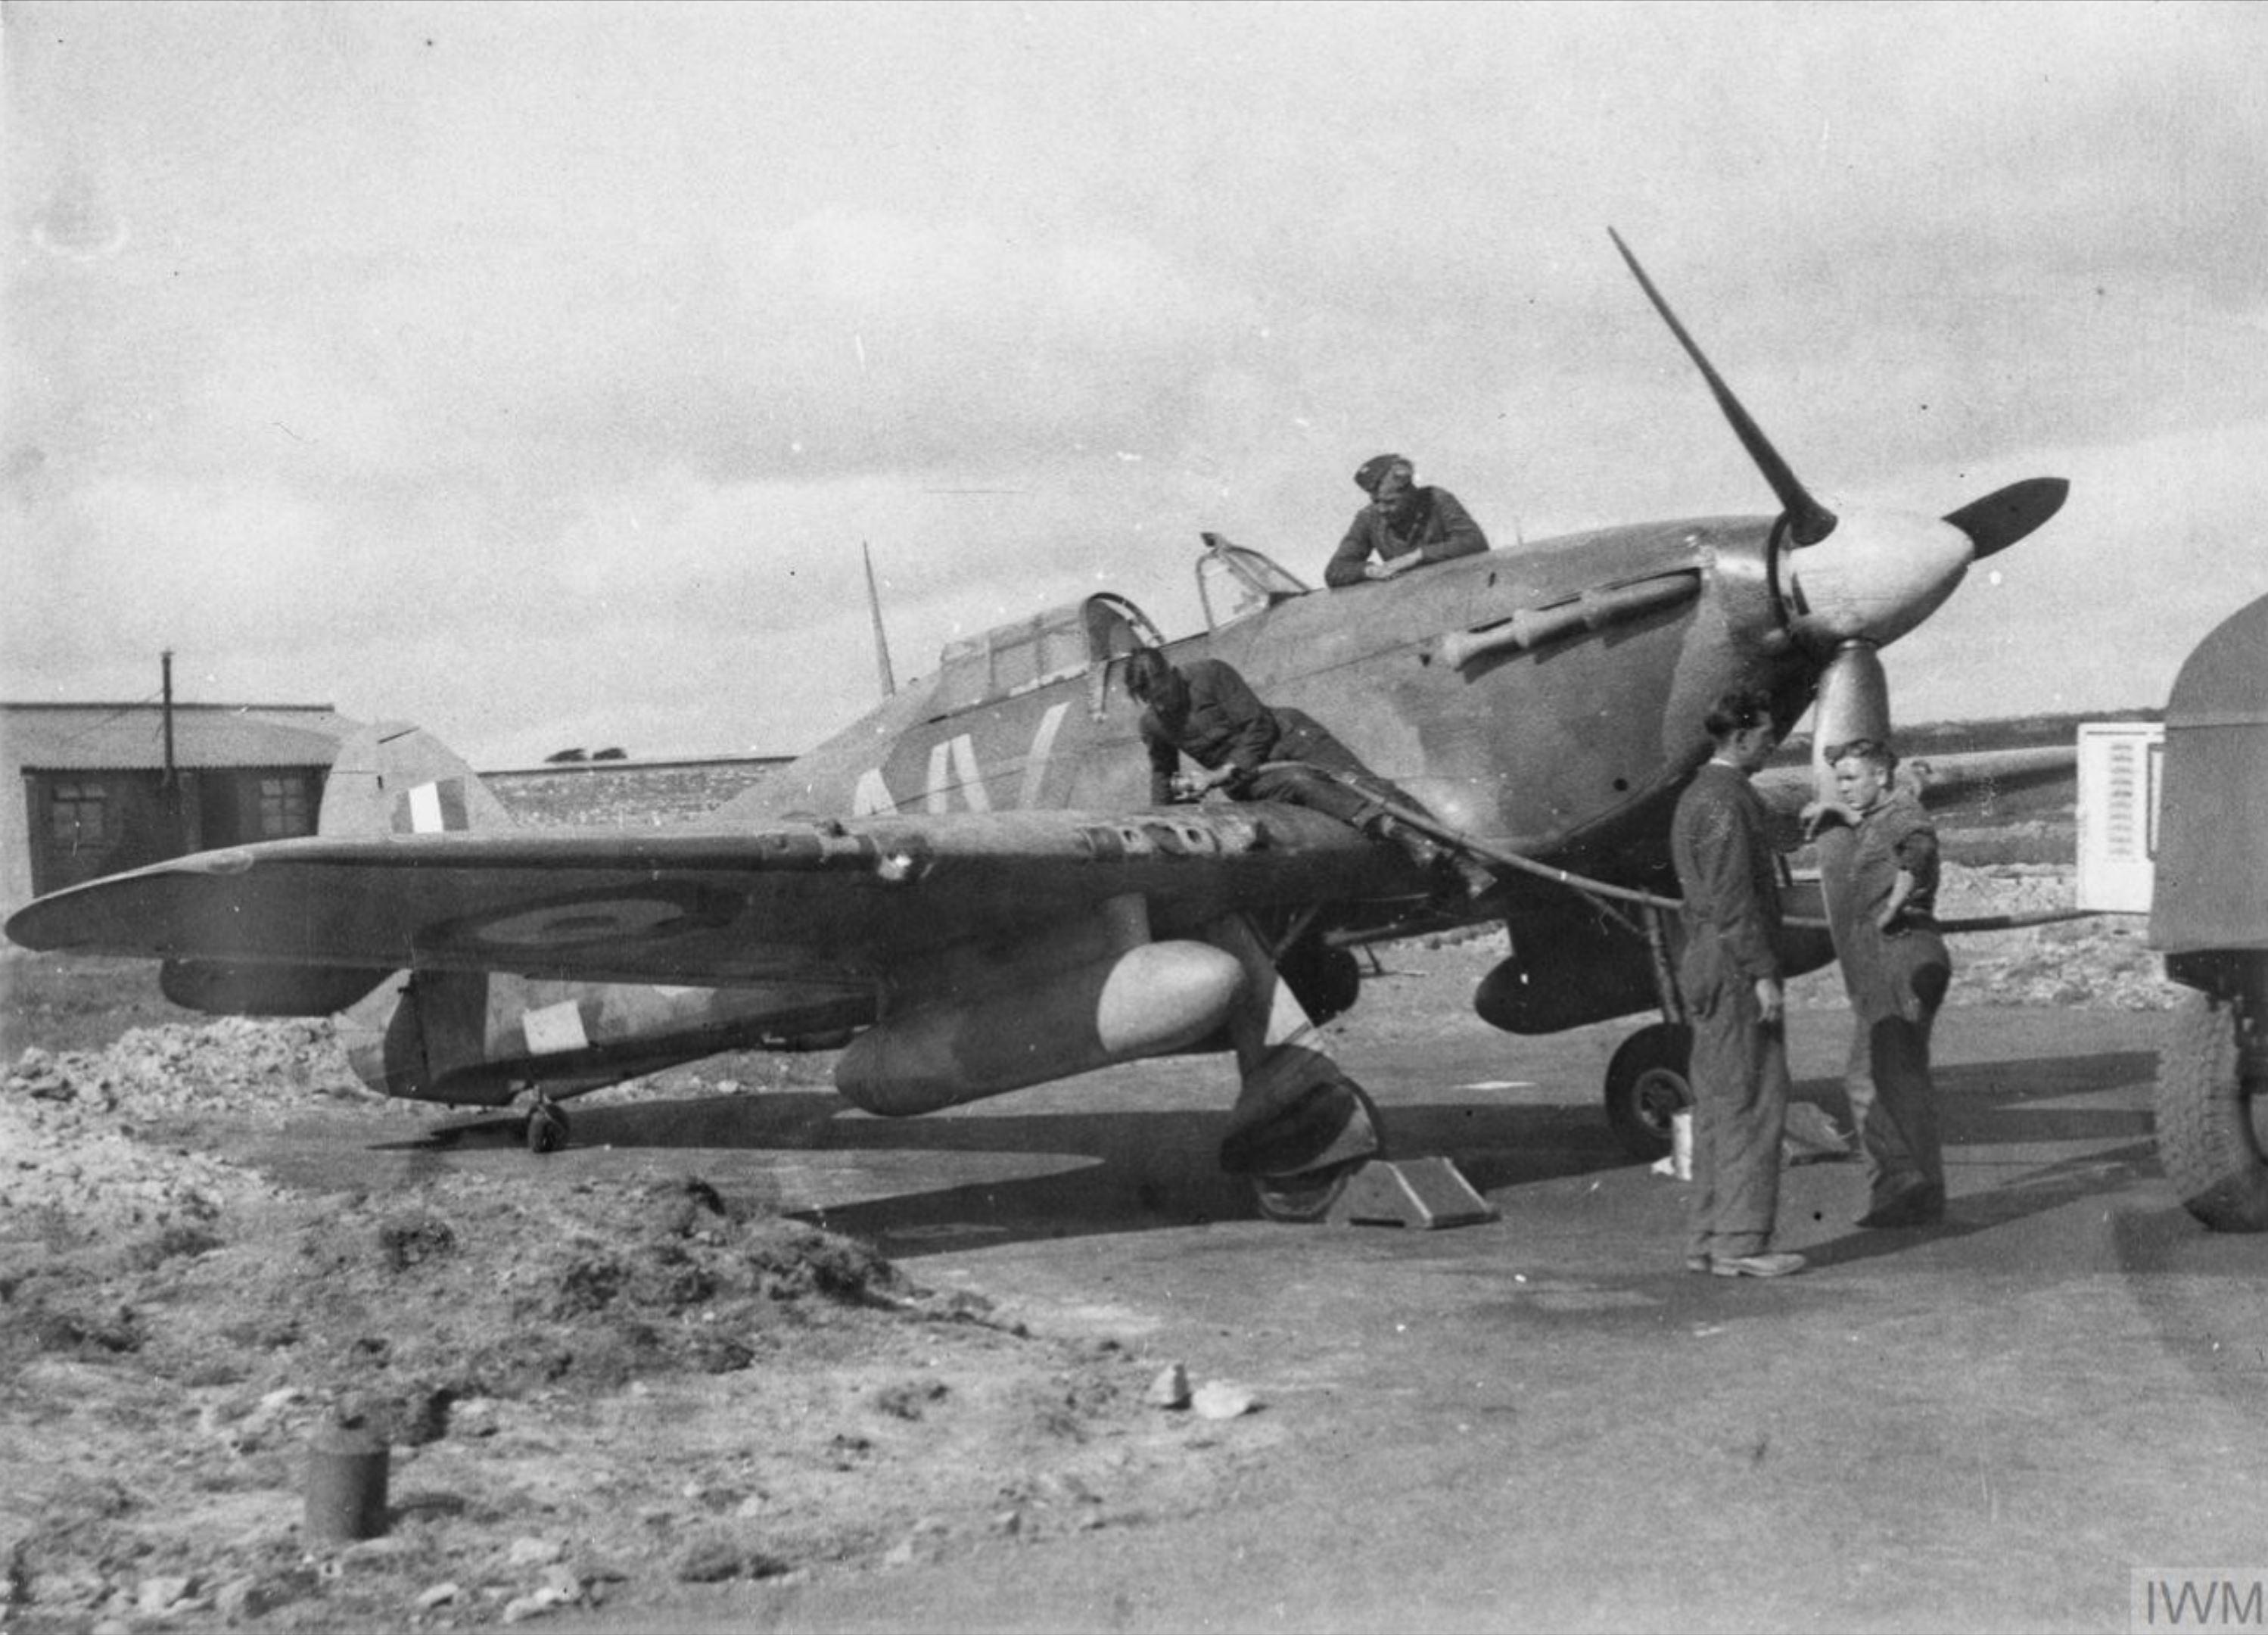 Hurricane IIb RAF 79Sqn ALV refuelling at Swansea 15 Sep 1941 IWM HU86315